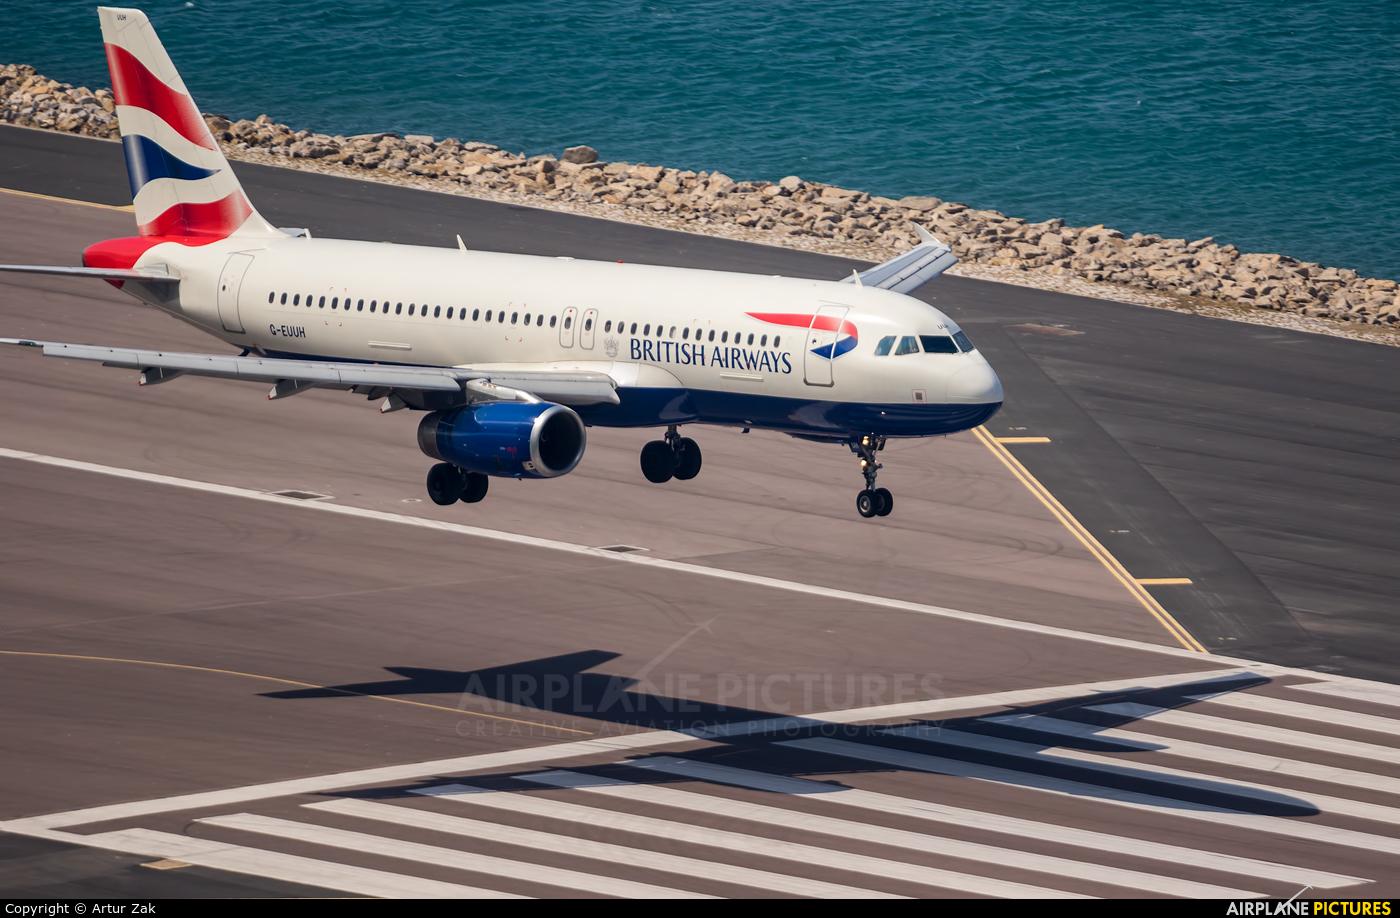 British Airways G-EUUH aircraft at Gibraltar